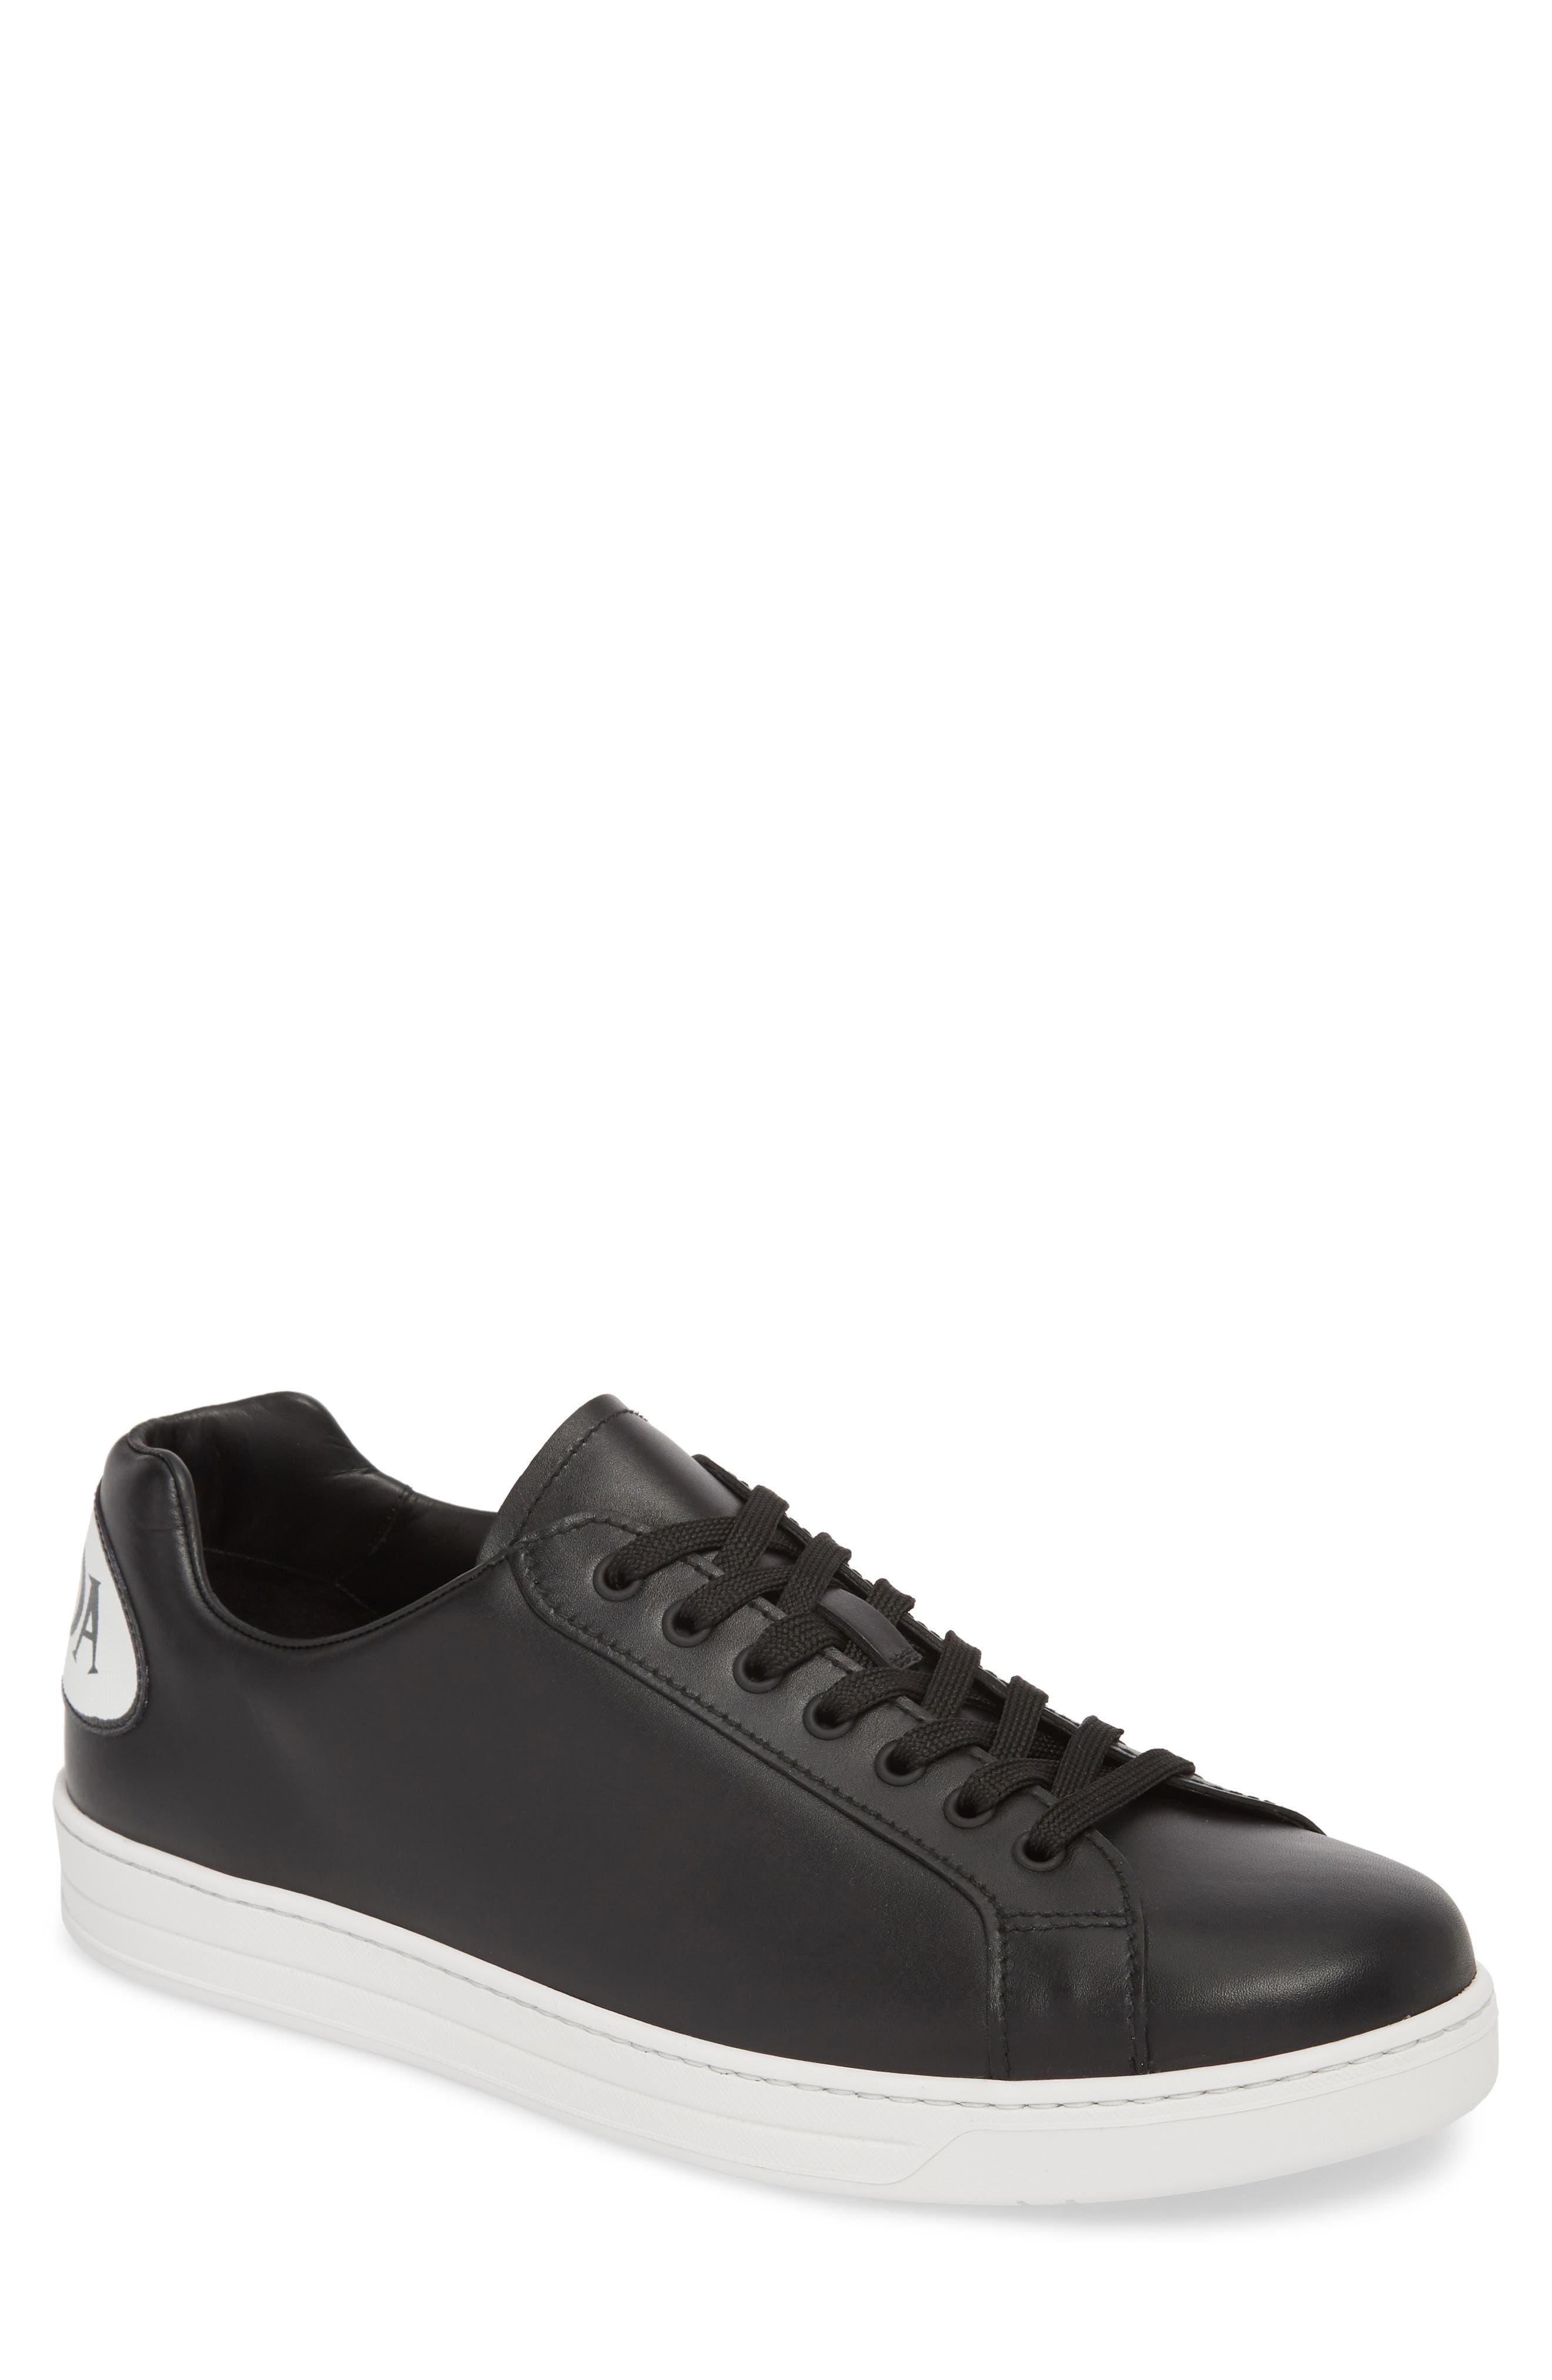 PRADA LINEA ROSSA,                             Patch Low Top Sneaker,                             Main thumbnail 1, color,                             012